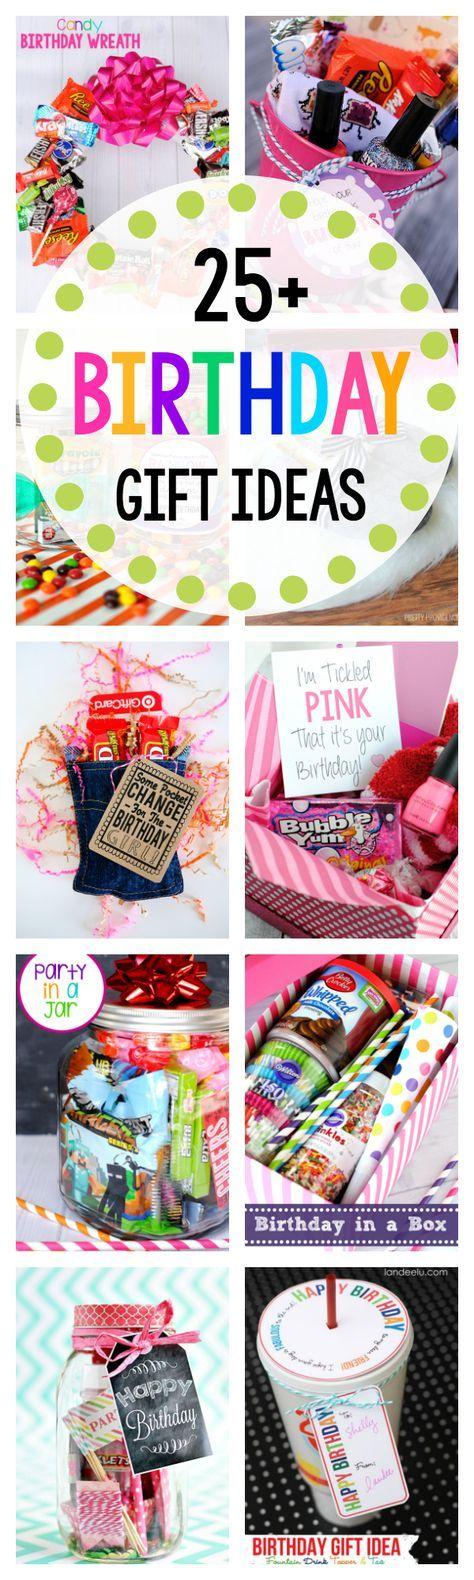 25 fun birthday gifts